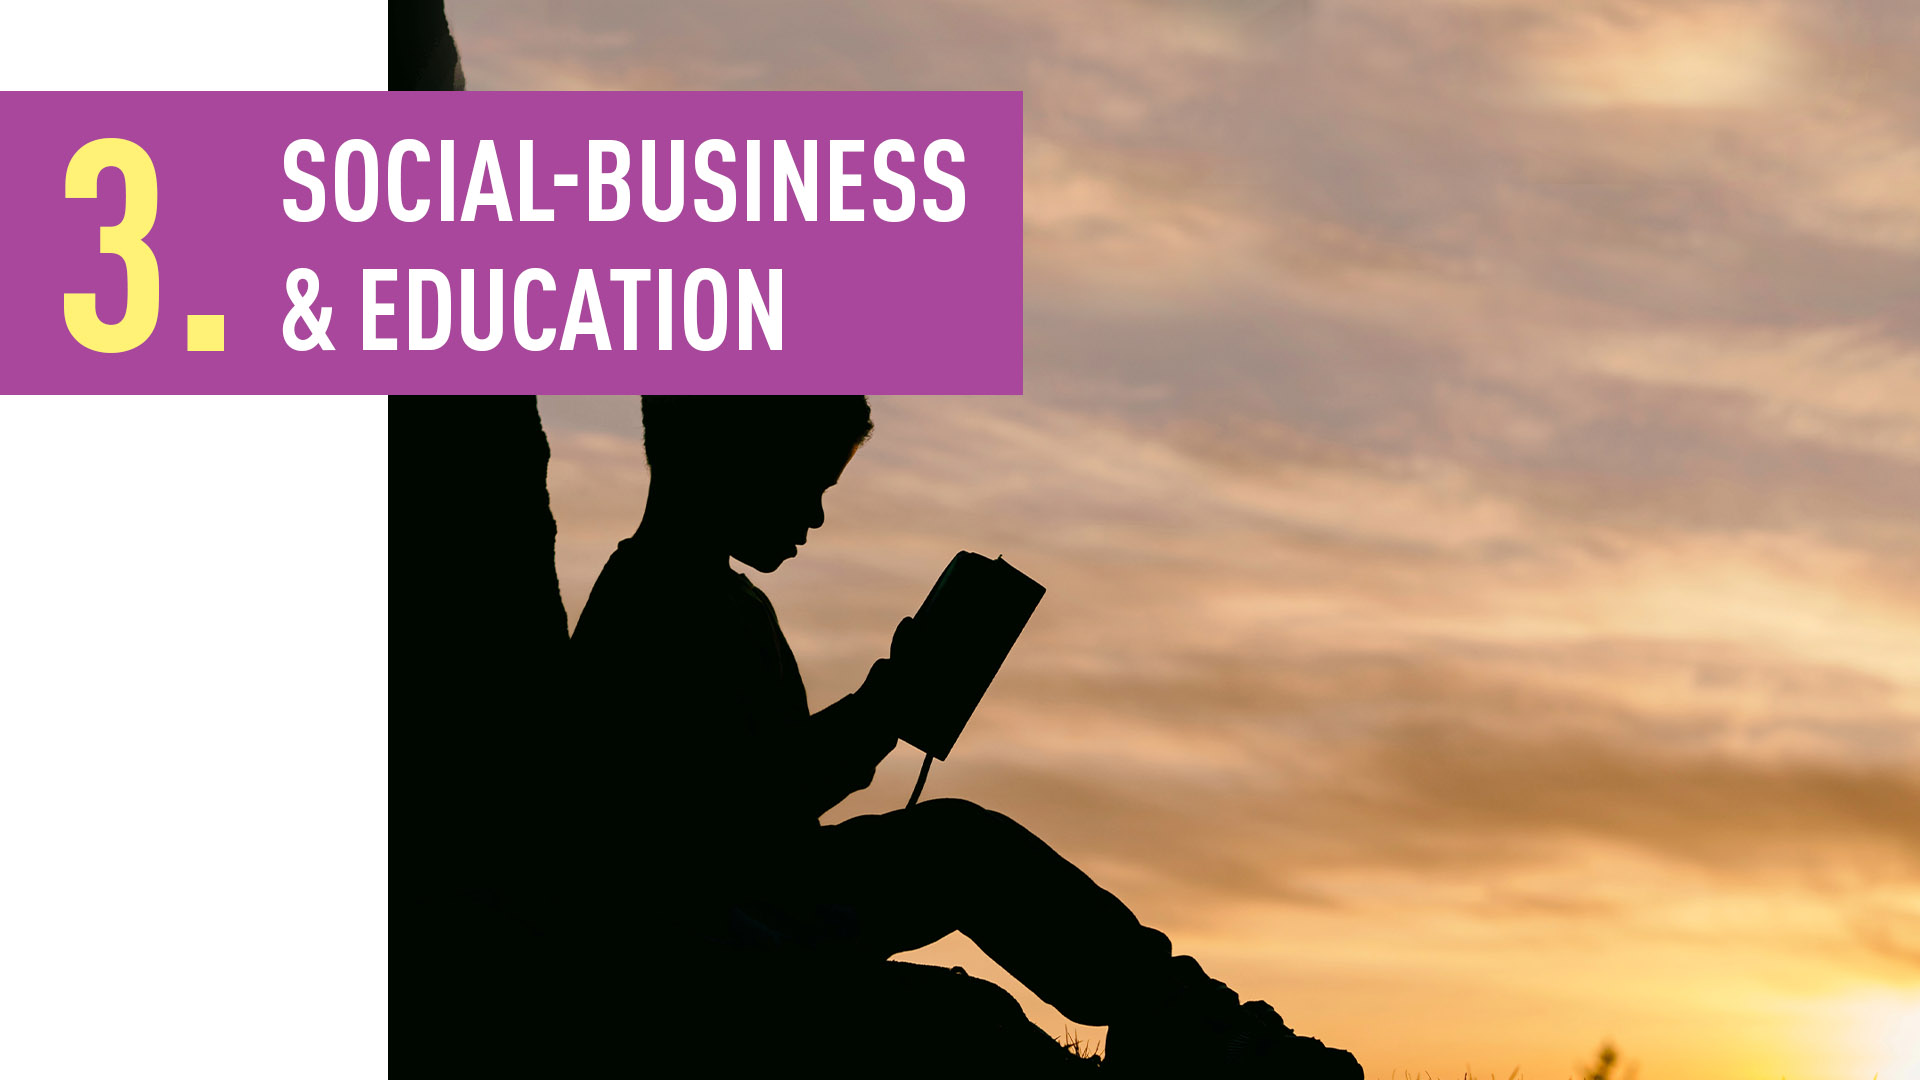 SOCIAL-BUSINESS & EDUCATION